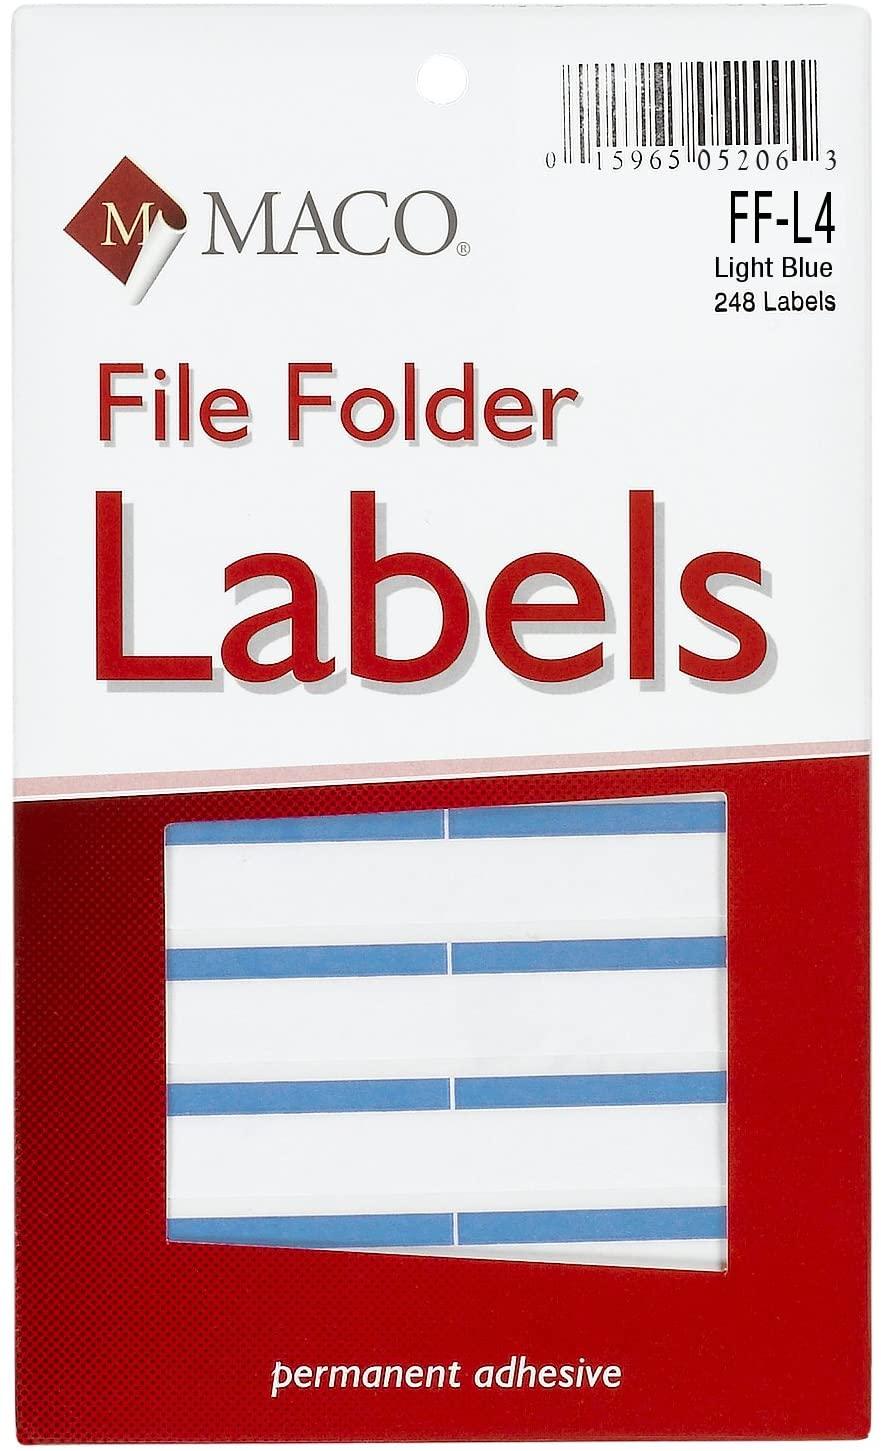 MACO Light Blue File Folder Labels, 9/16 x 3-7/16 Inches, 248 Per Box (FF-L4)